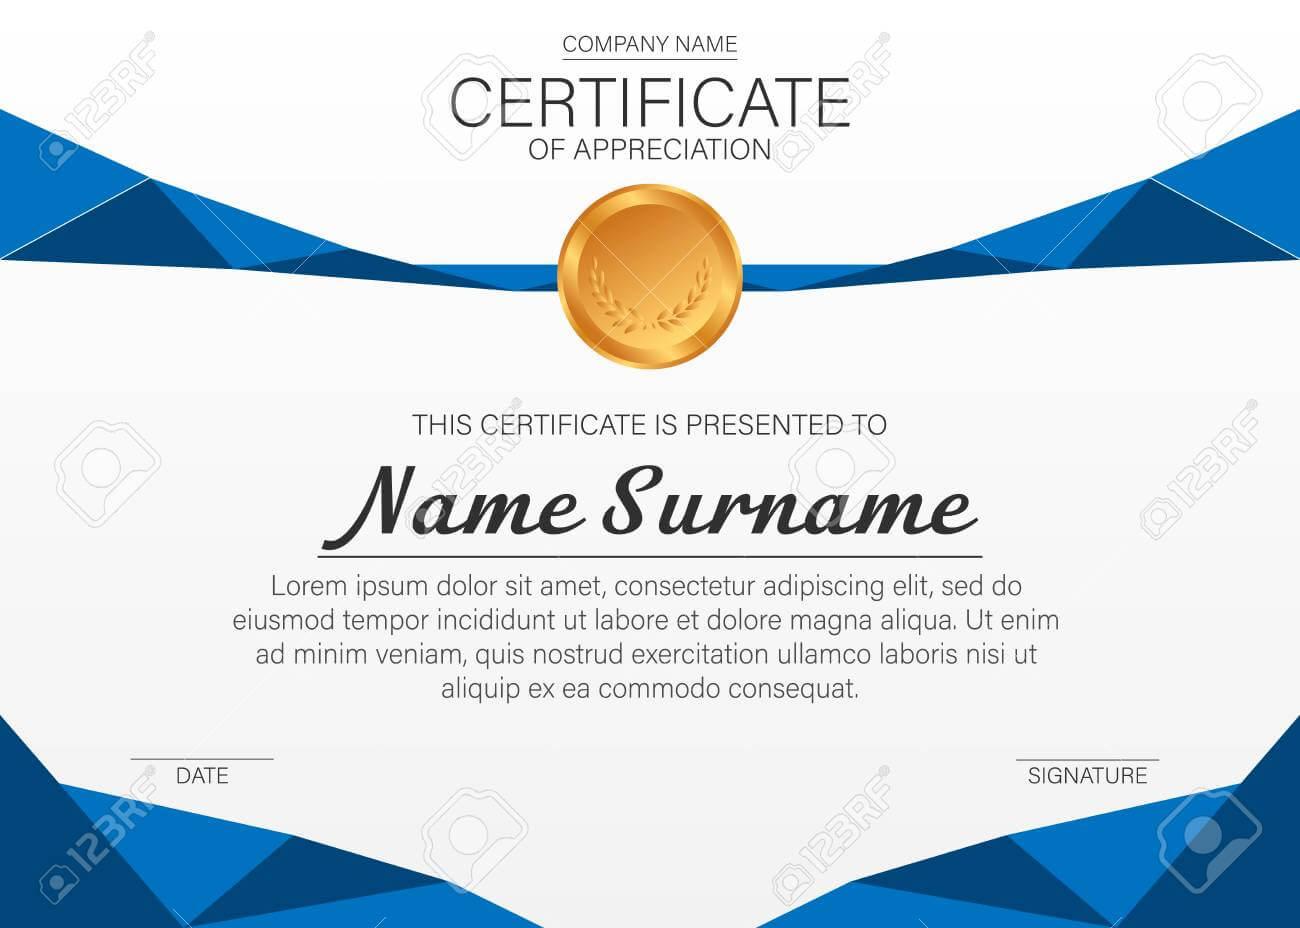 Beautiful Certificate Template. Vector Design For Award, Diploma Throughout Beautiful Certificate Templates